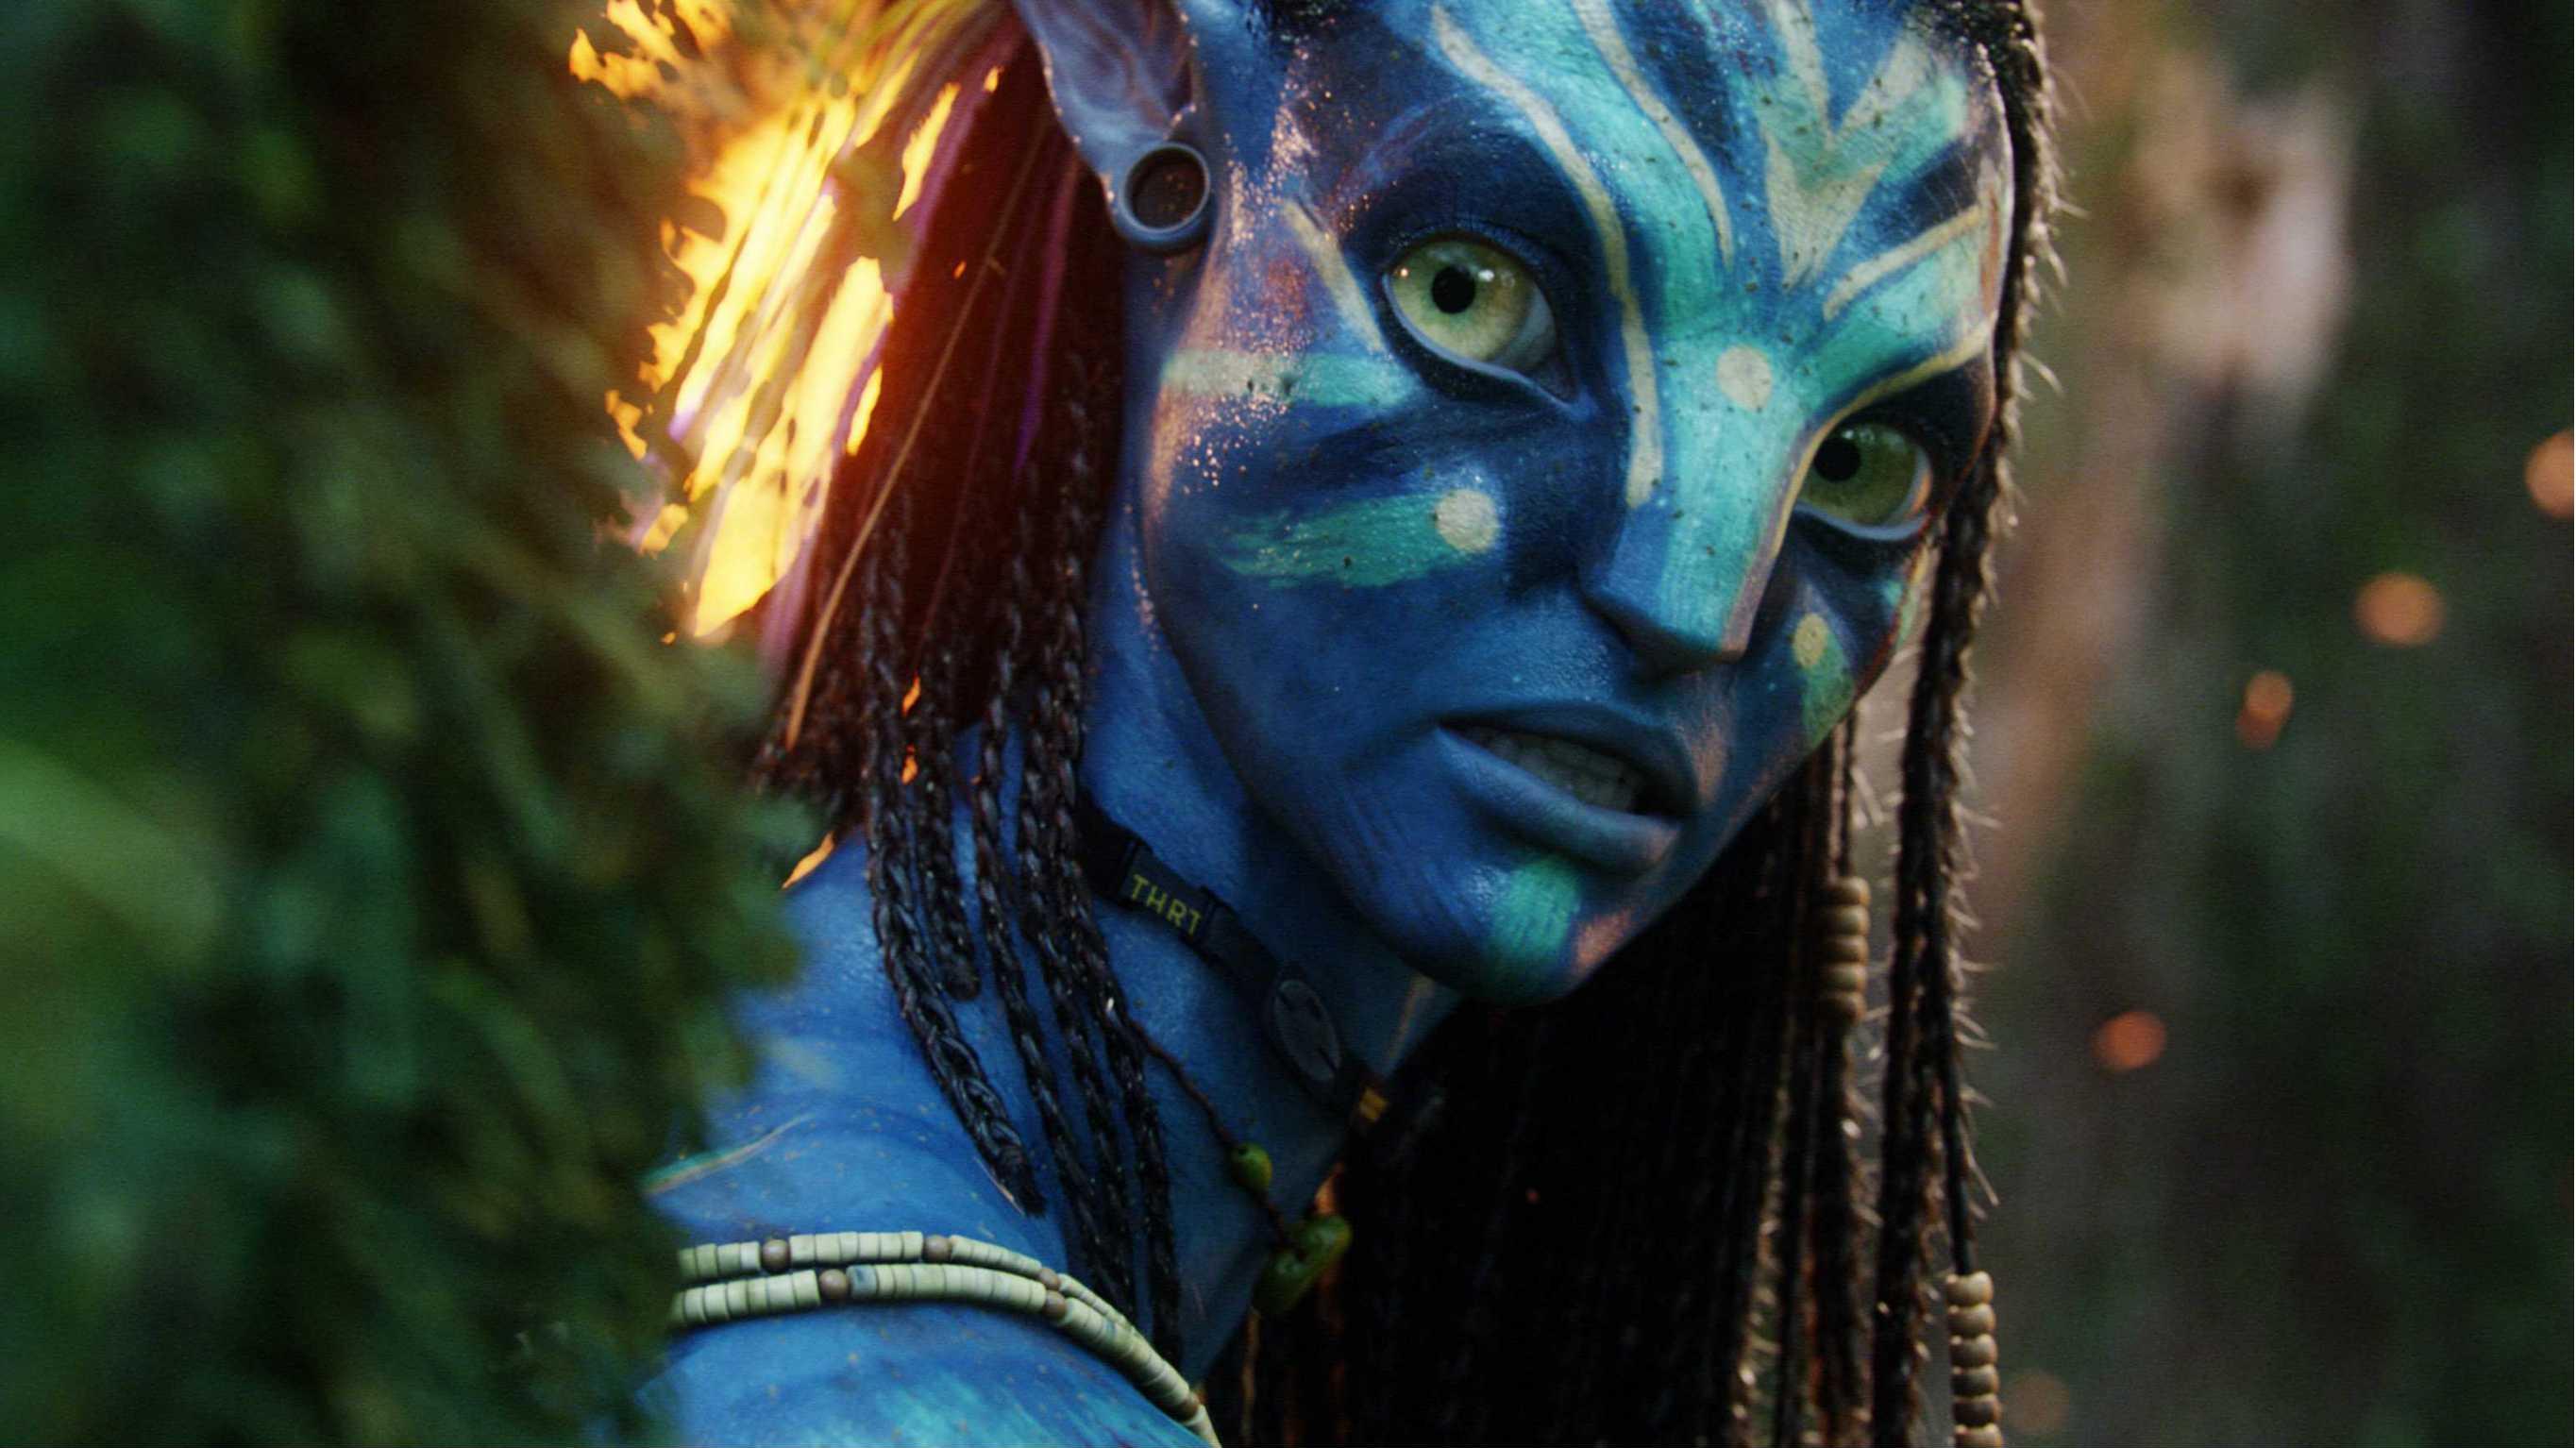 Avatar Wallpaper – y Na vi